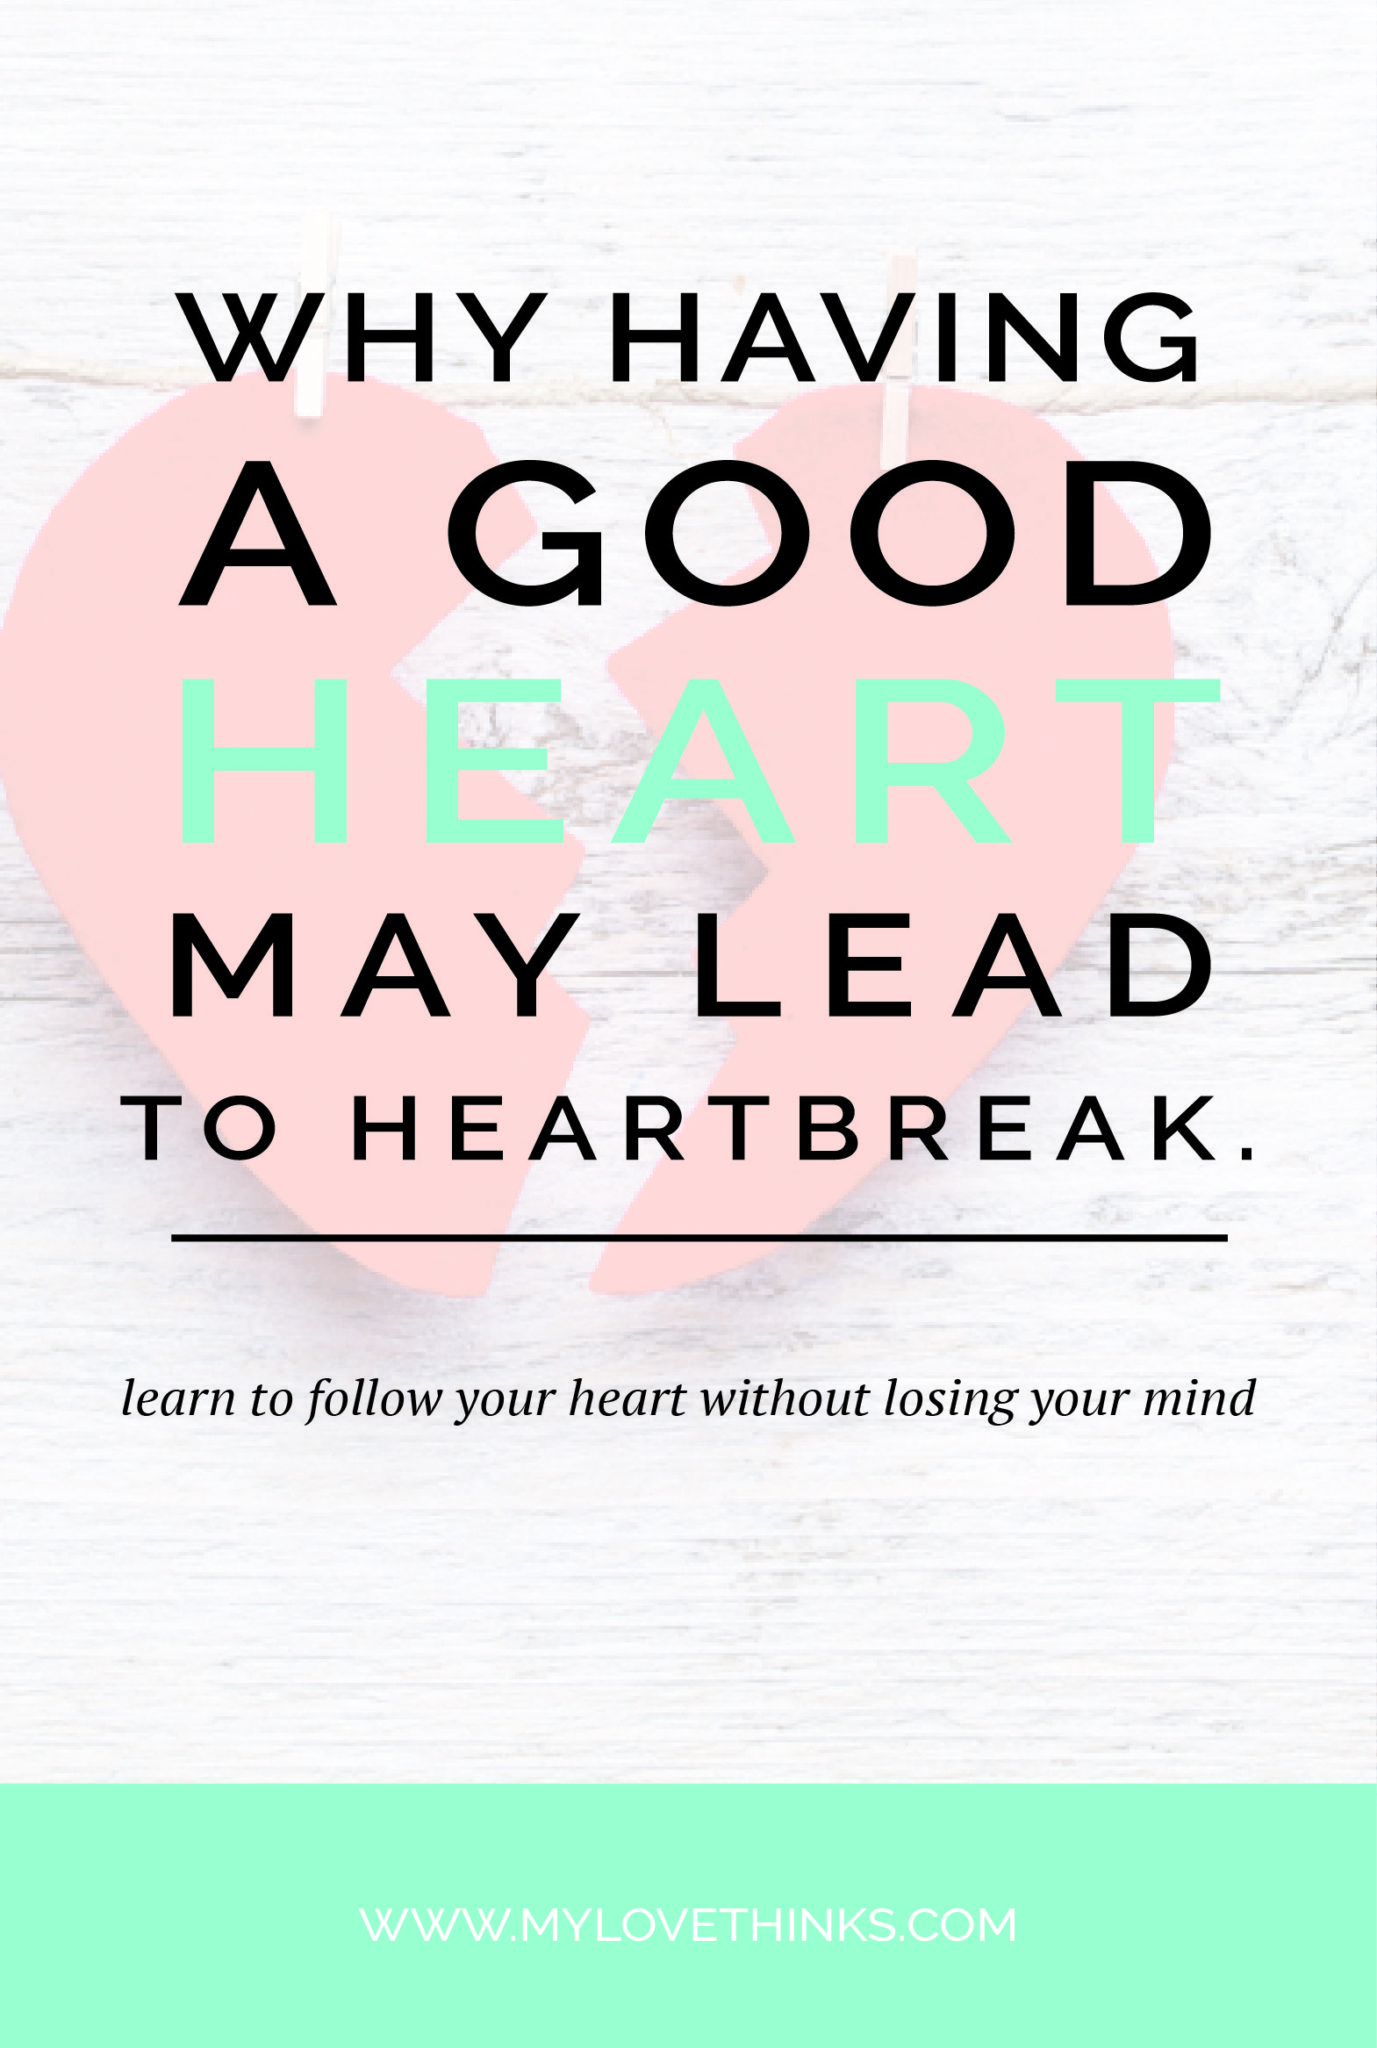 why having a good heart may lead to heartbreak